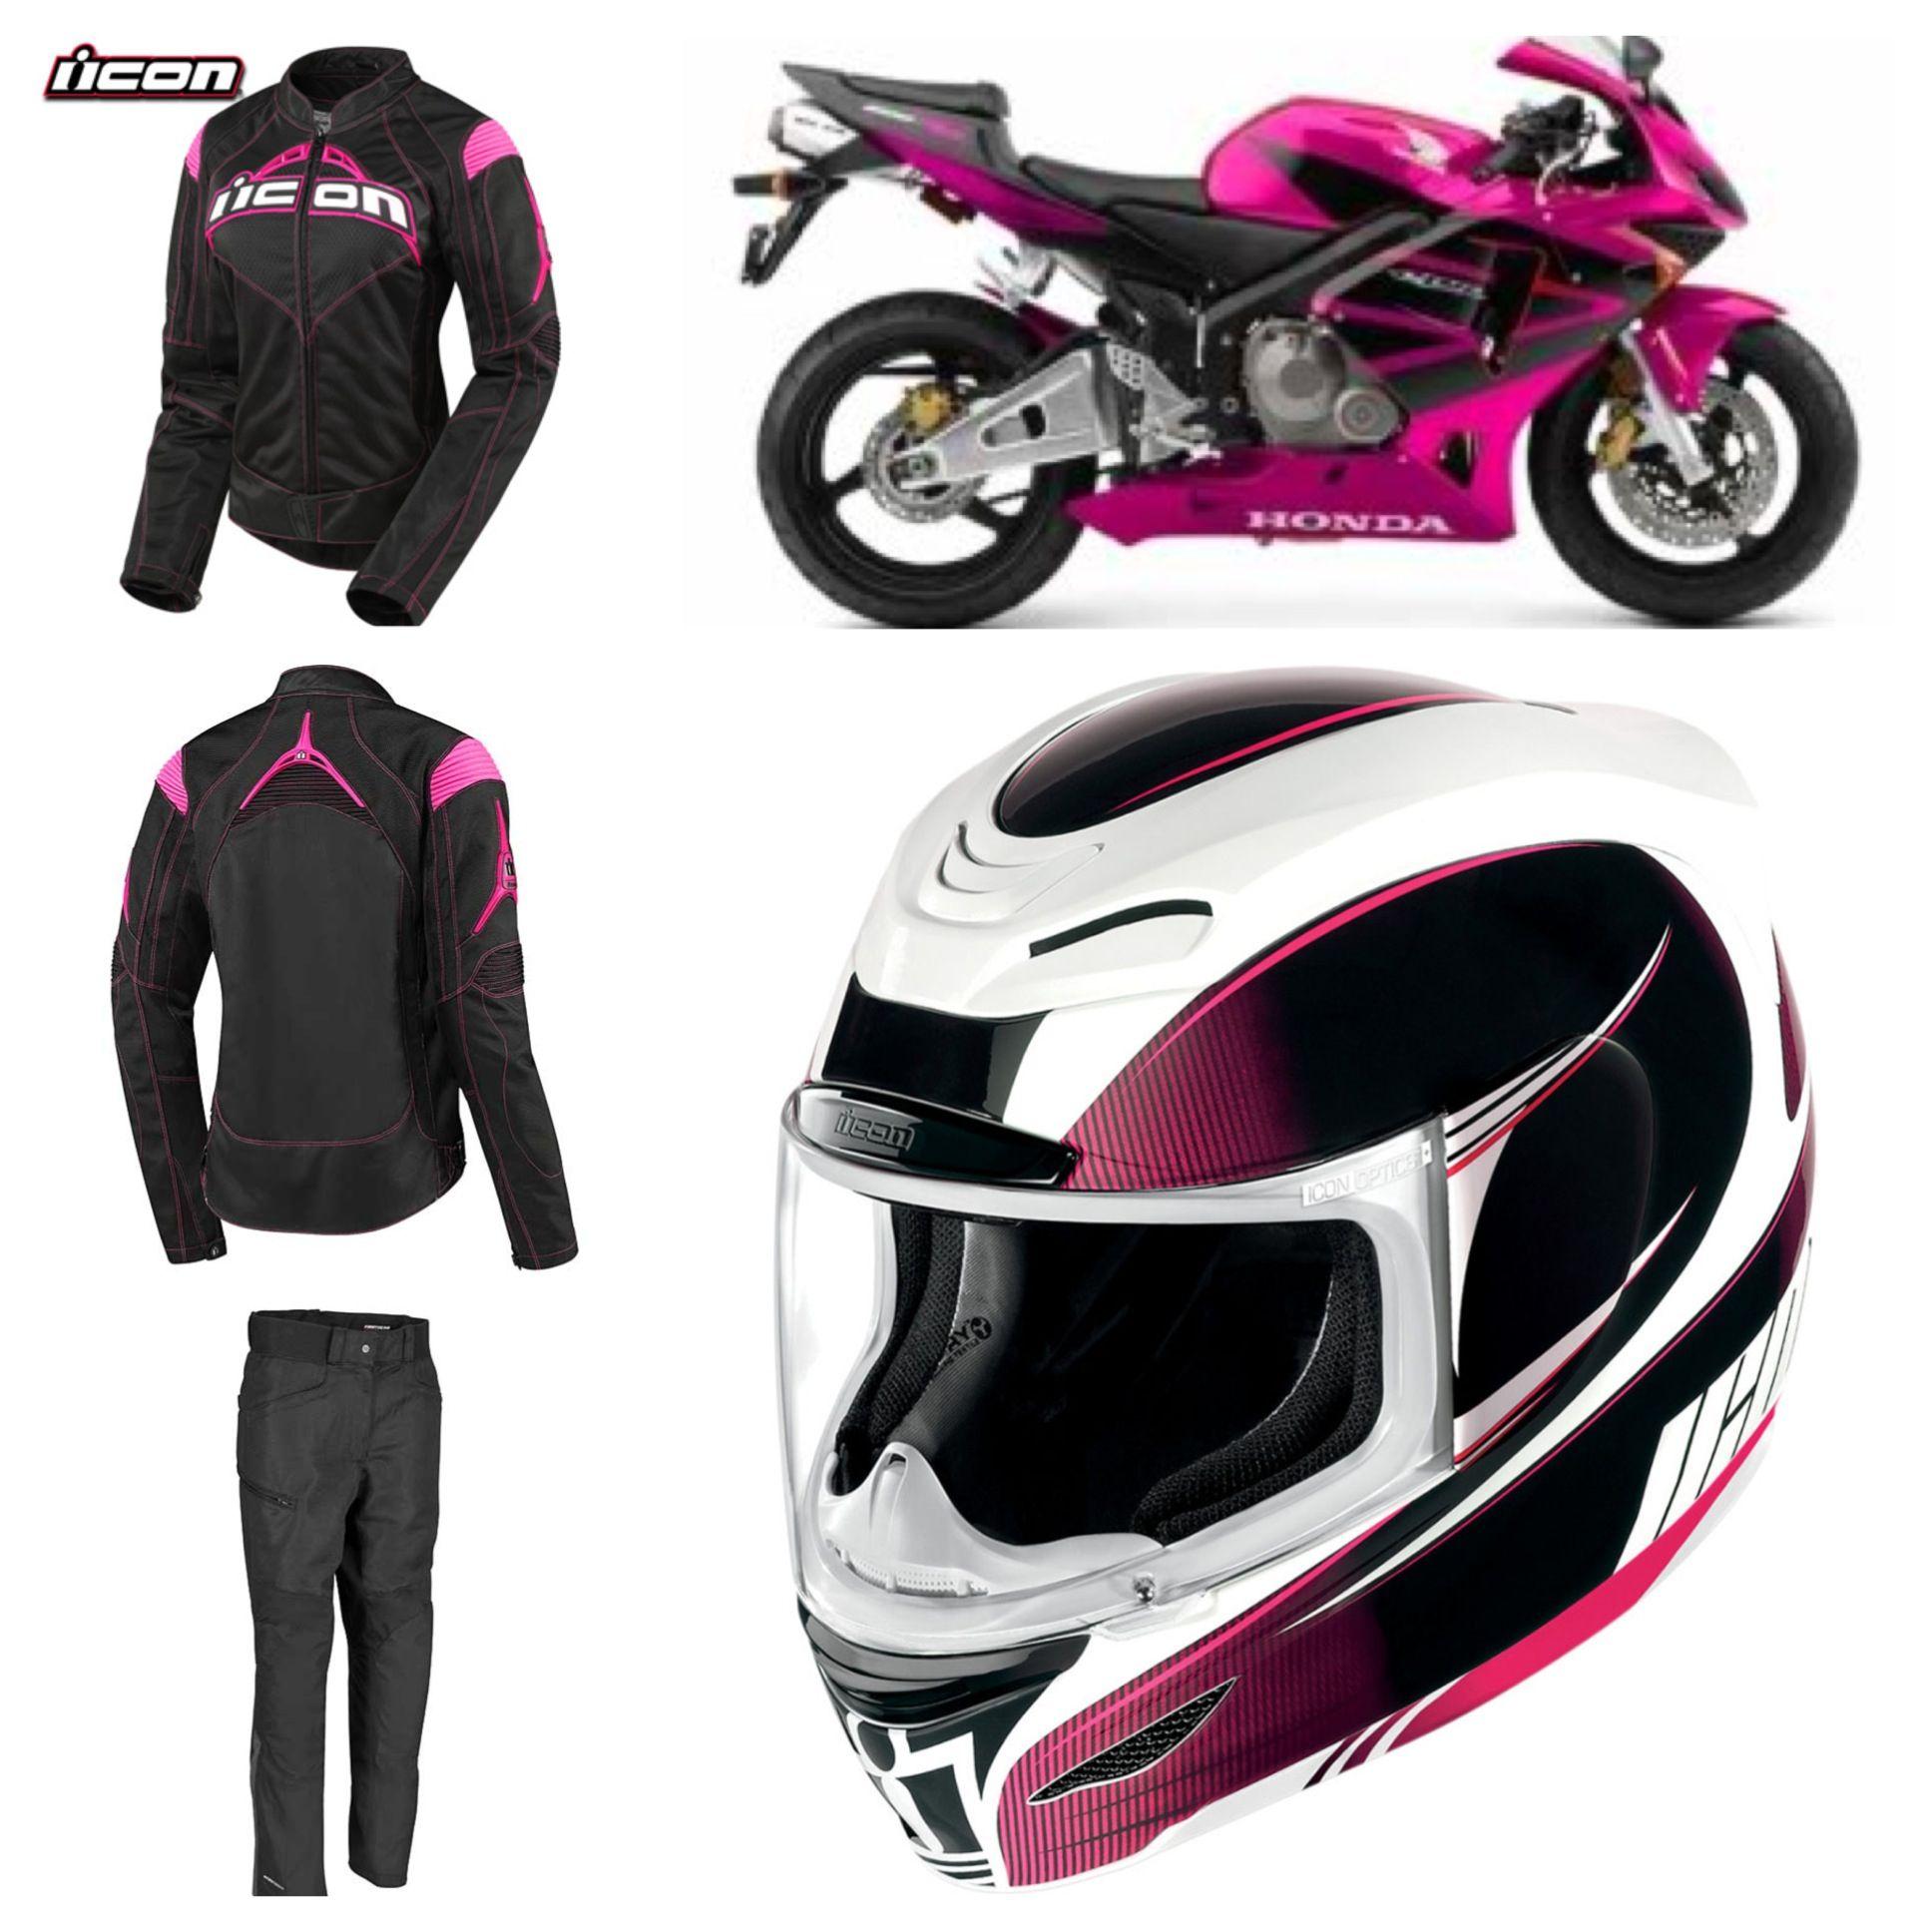 Street Bike Crotch Rocket Performance Motorcycle Sport And